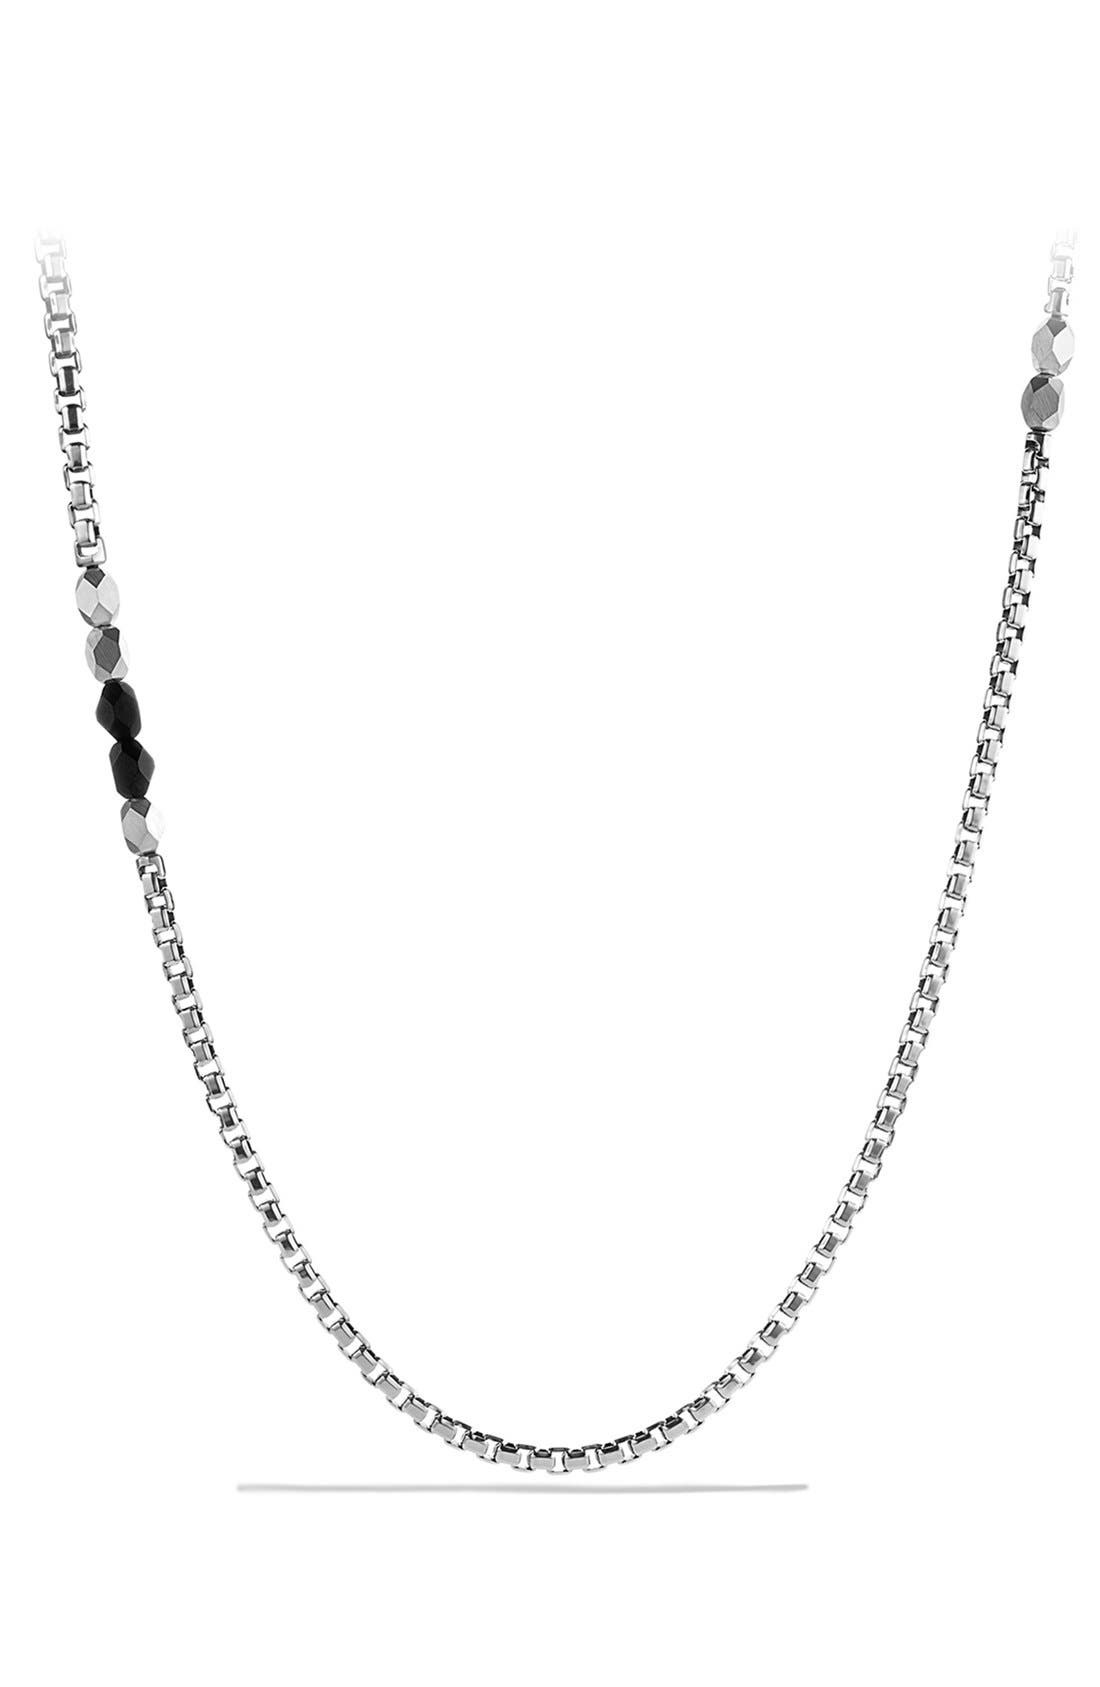 Alternate Image 1 Selected - David Yurman 'Faceted' Metal Necklace